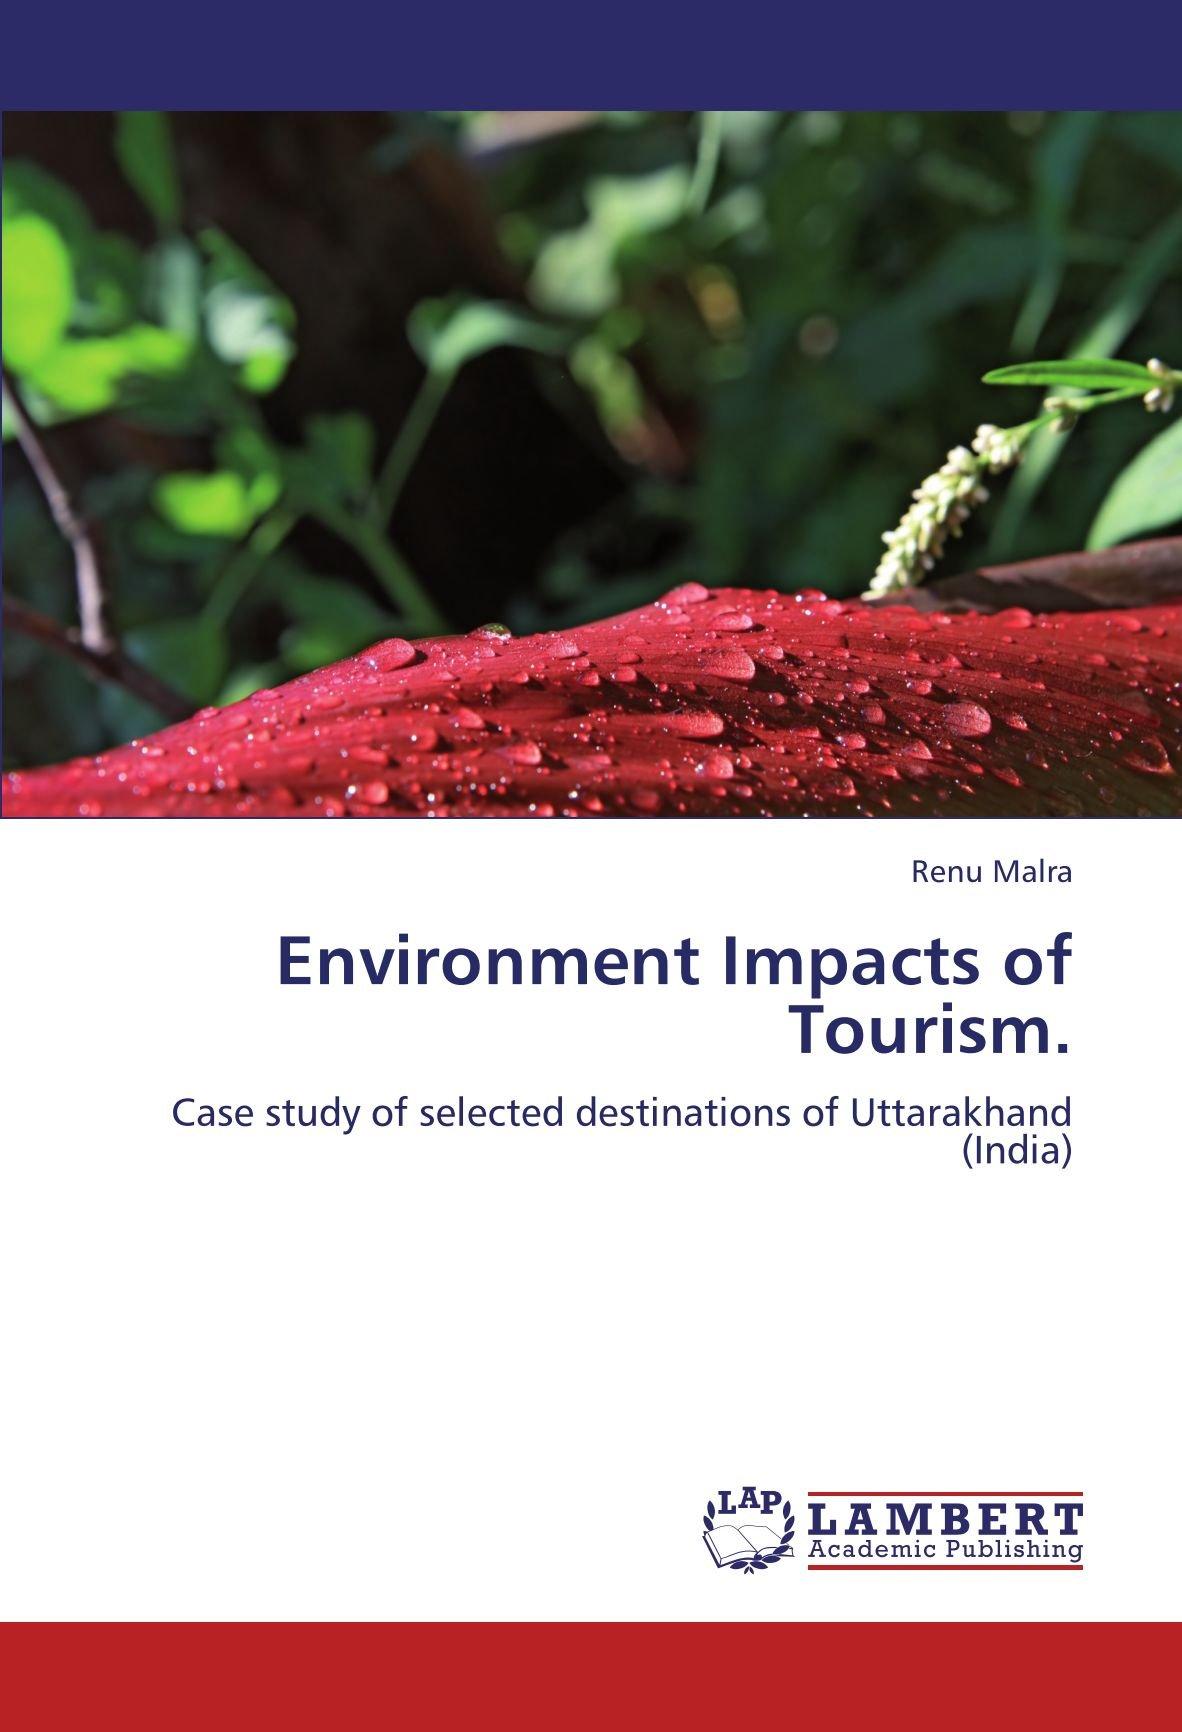 Environment Impacts of Tourism.: Case study of selected destinations of Uttarakhand (India) pdf epub